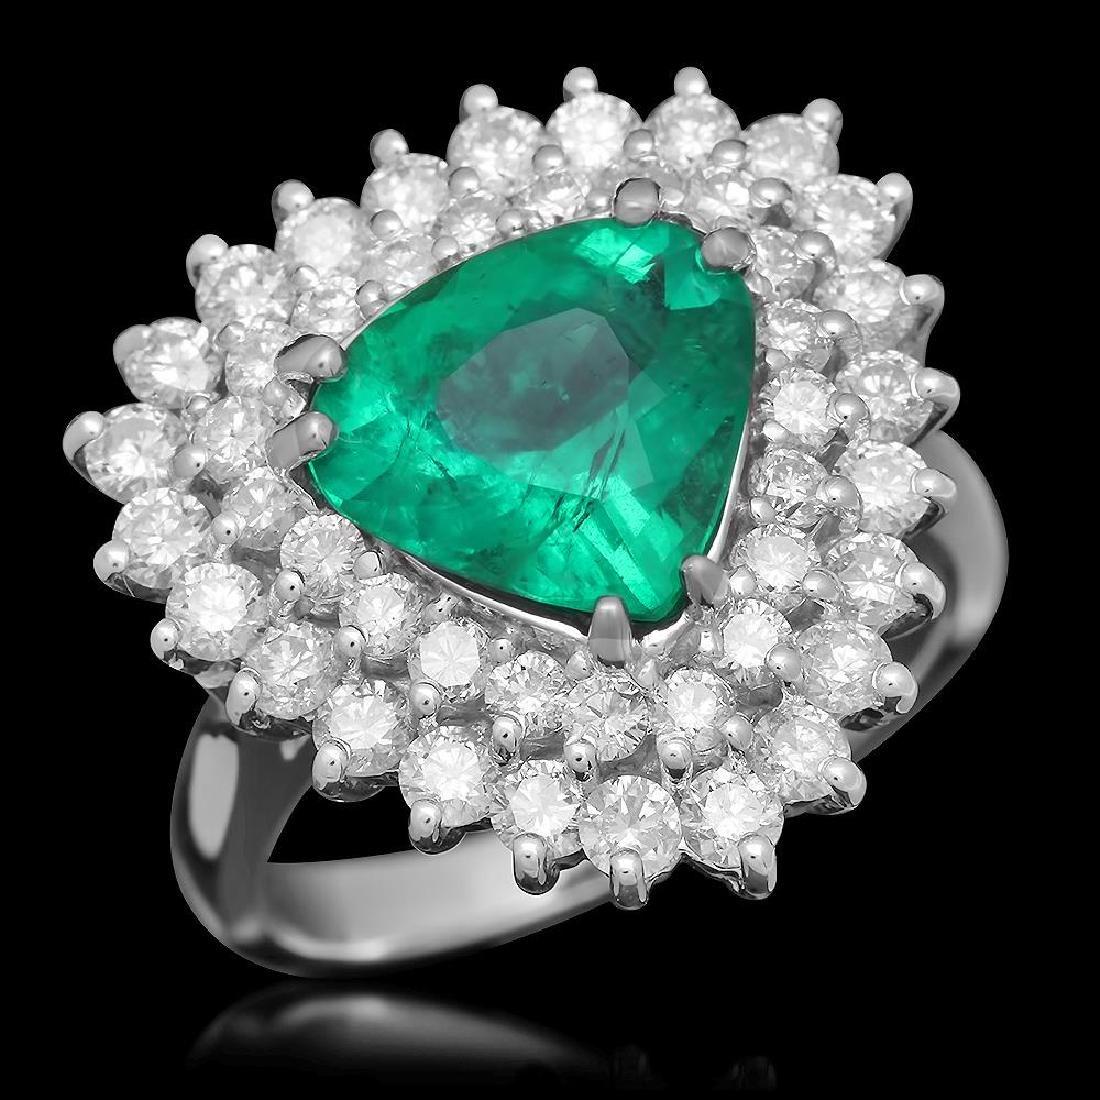 14K Gold 2.28 Emerald 1.70 Diamond Ring